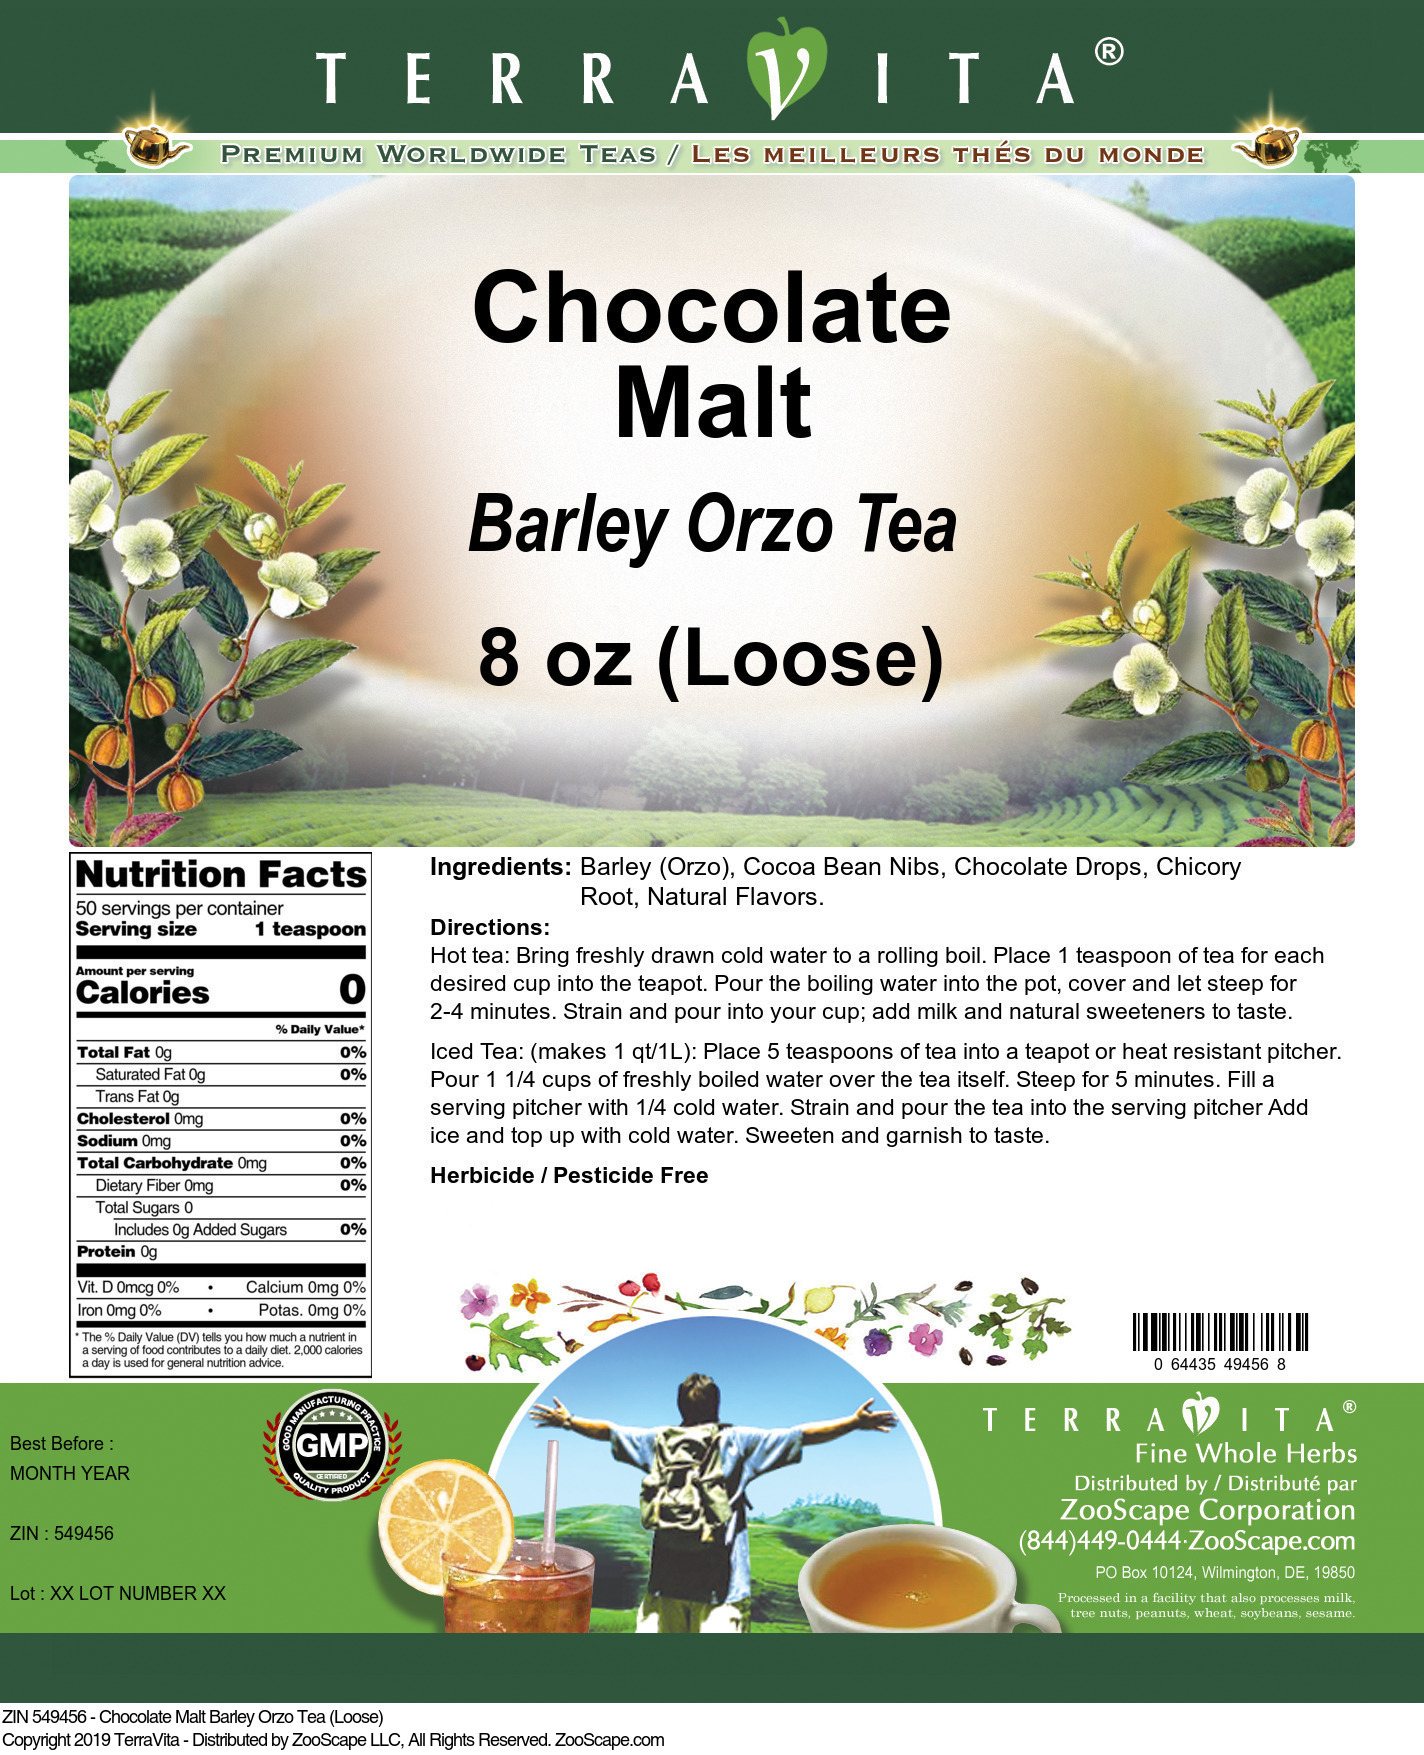 Chocolate Malt Barley Orzo Tea (Loose)